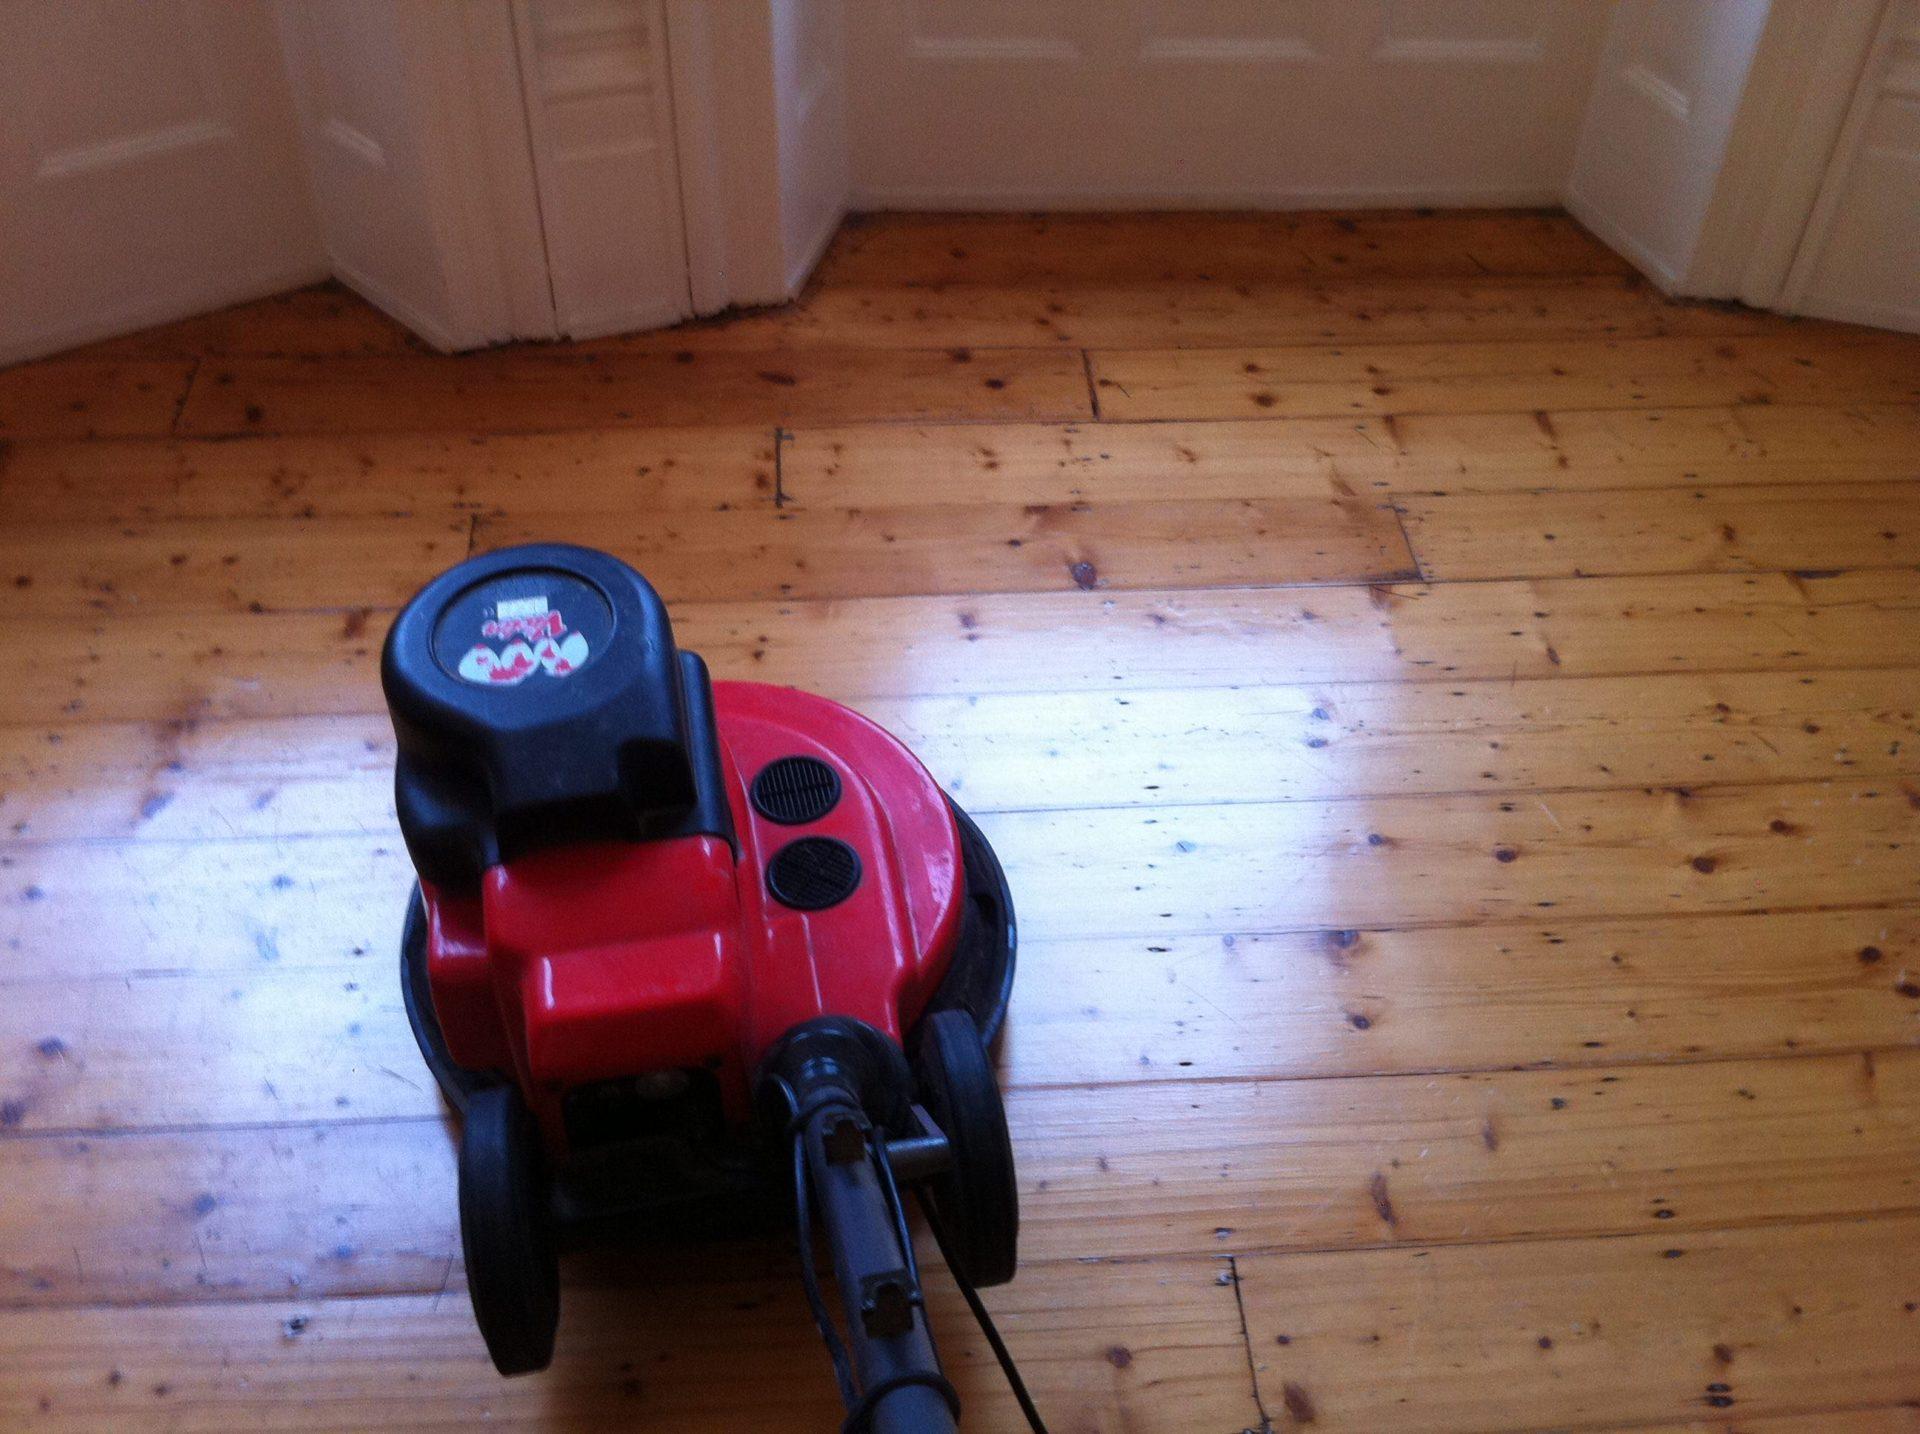 Wood Floor Cleaning Waxing Polishing Maintenance Brighton Hove East Sussex